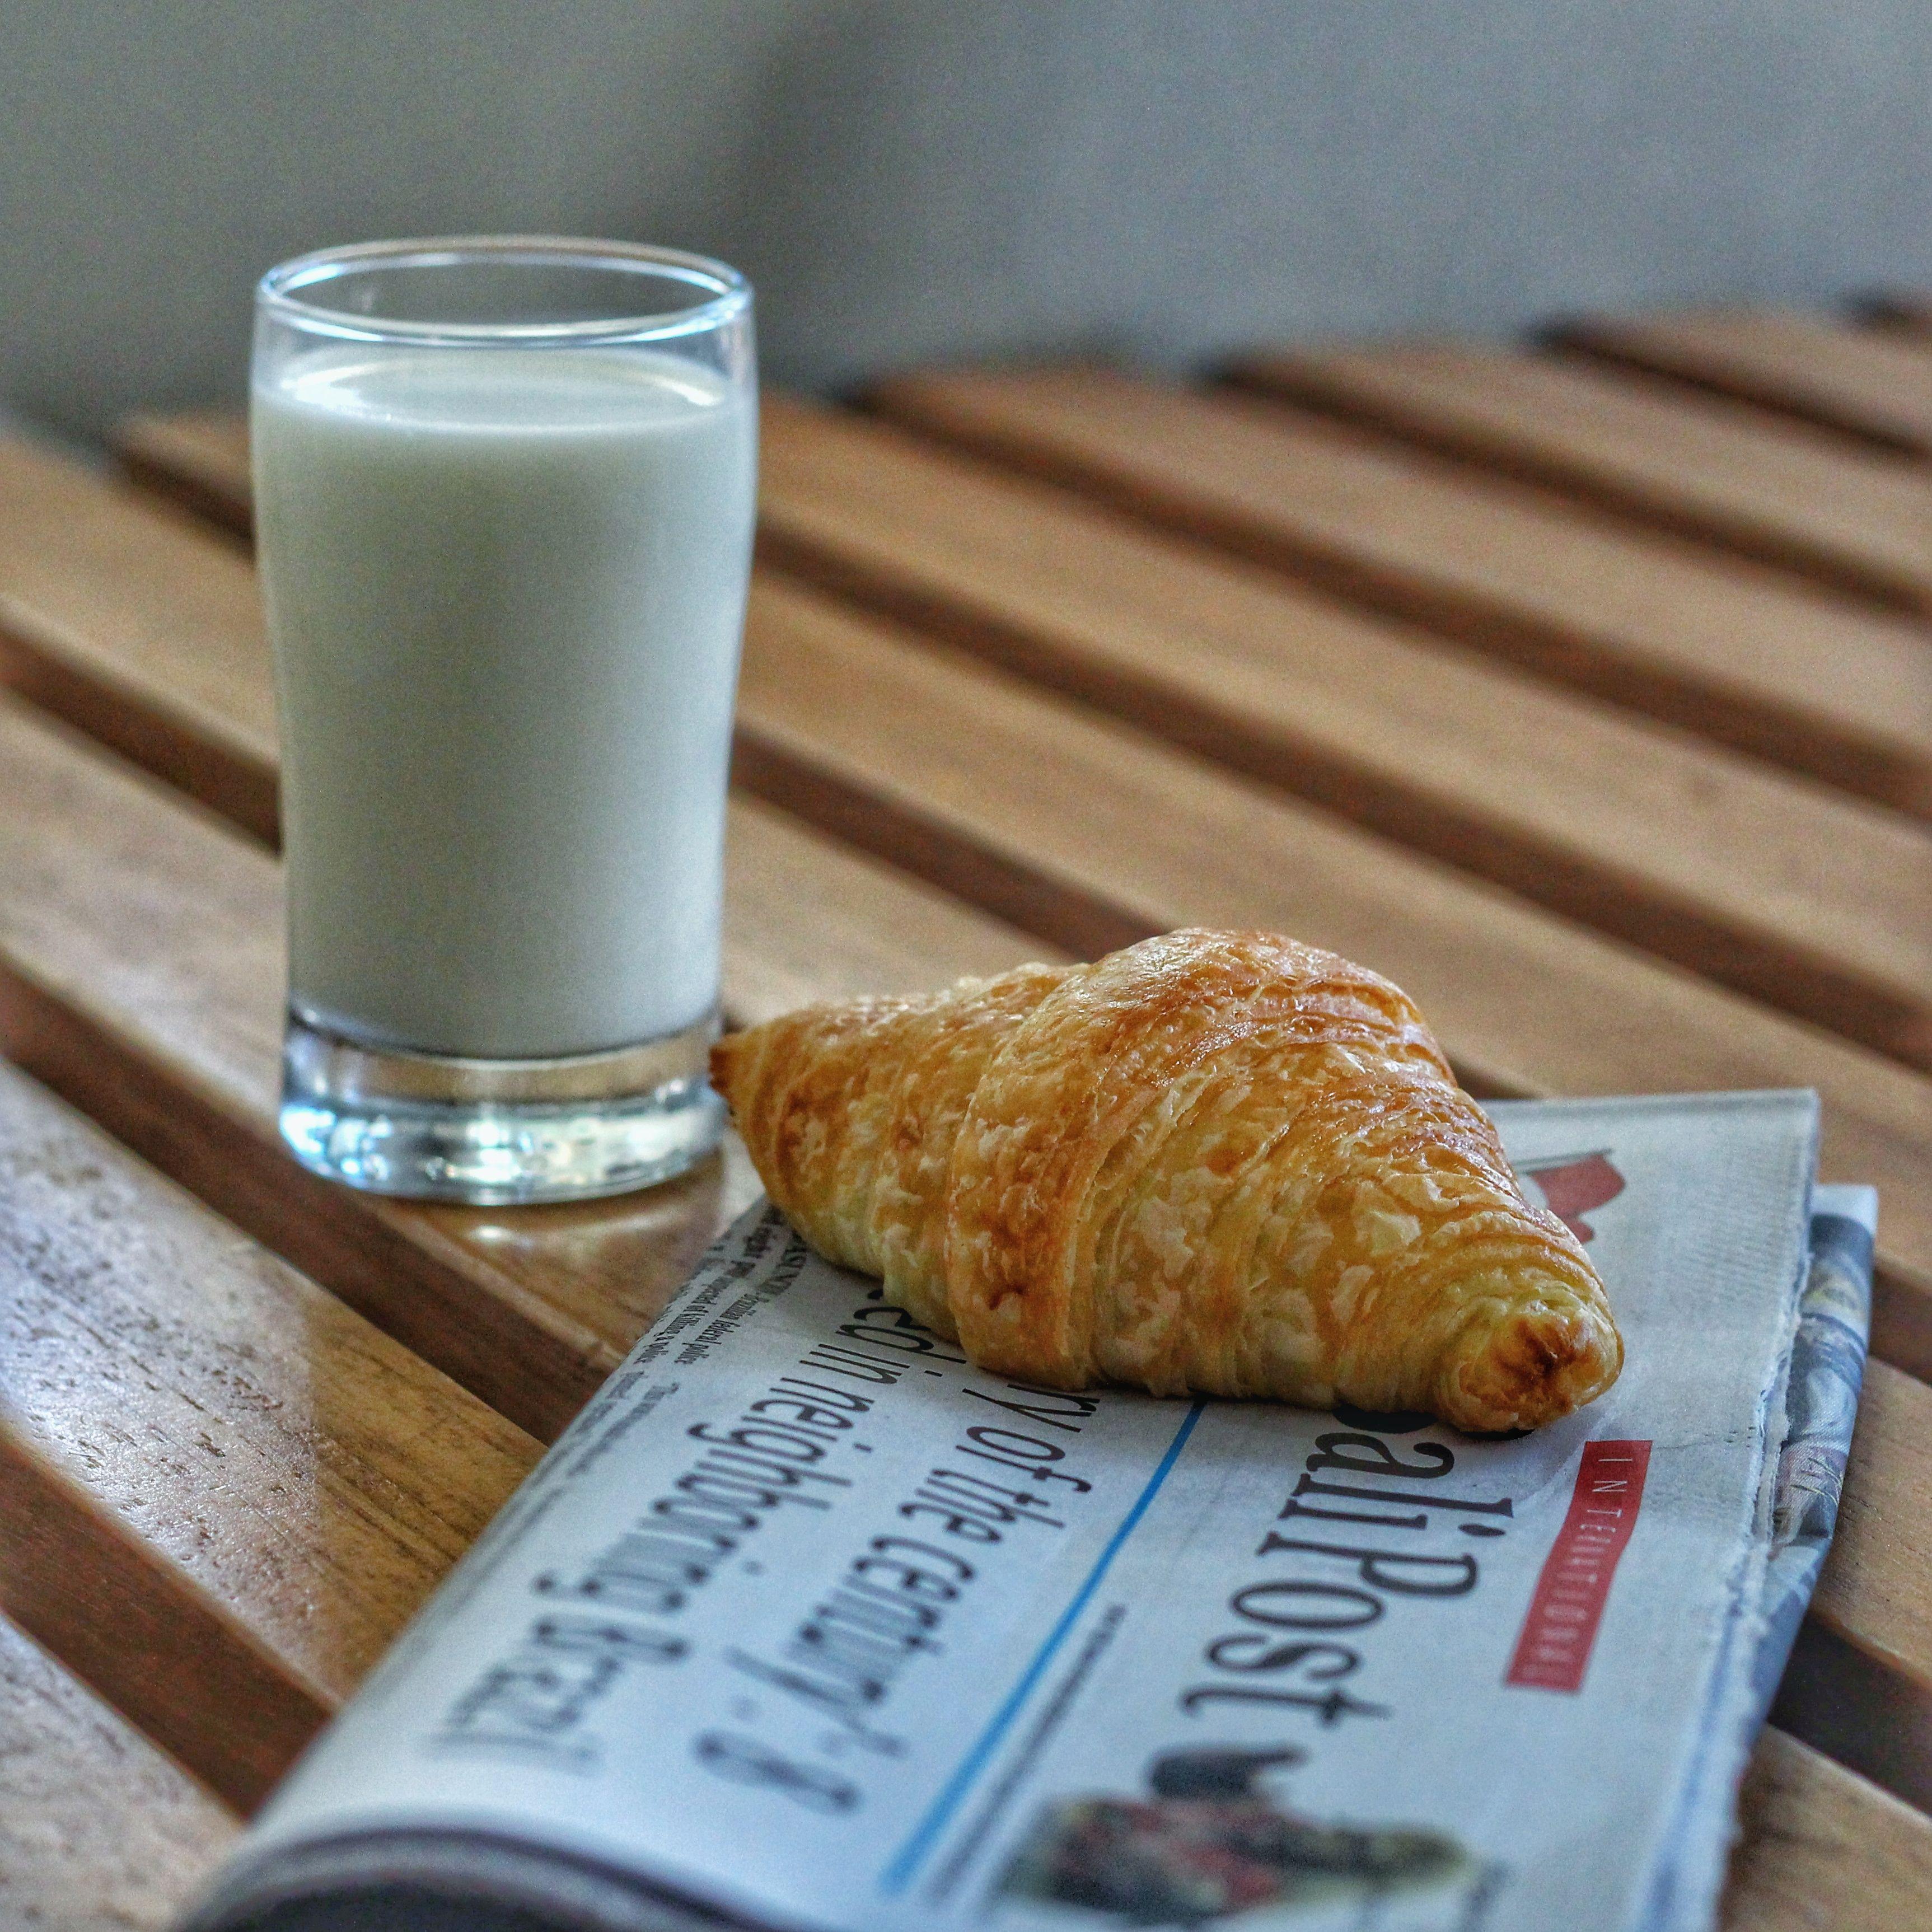 Kickstart your day with breakfast!